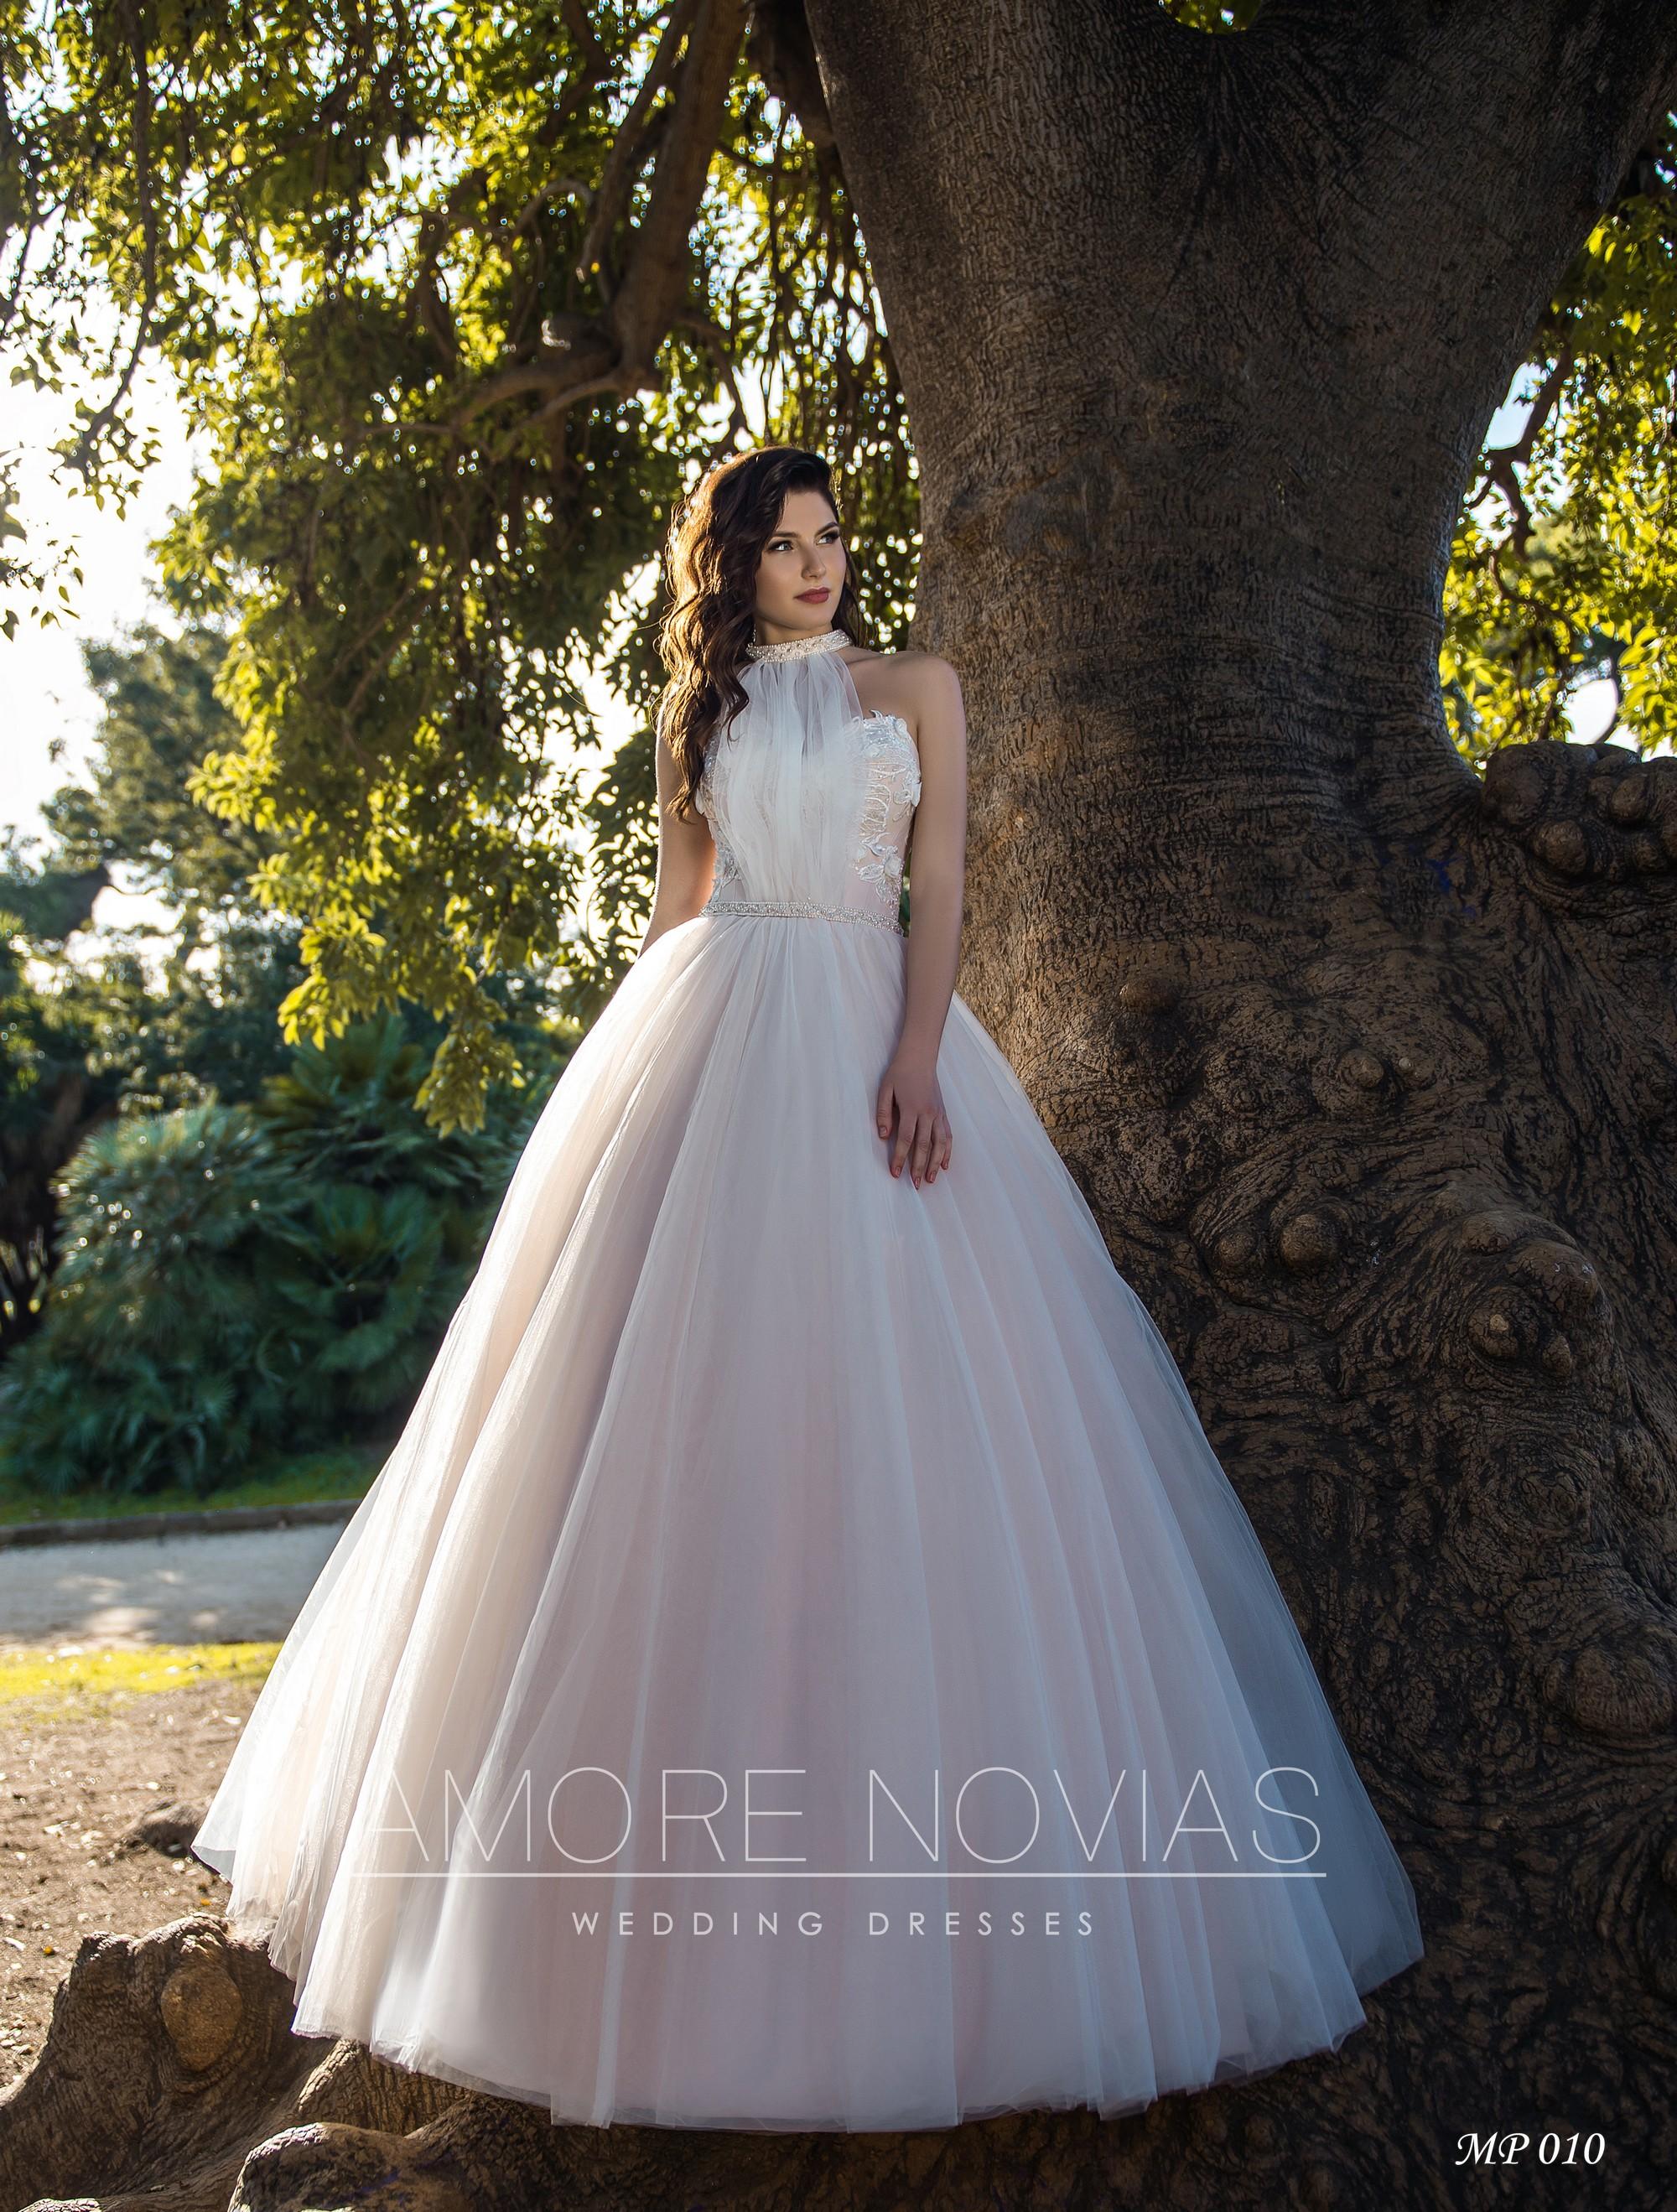 https://amore-novias.com/images/stories/virtuemart/product/mp-010--------(1).jpg